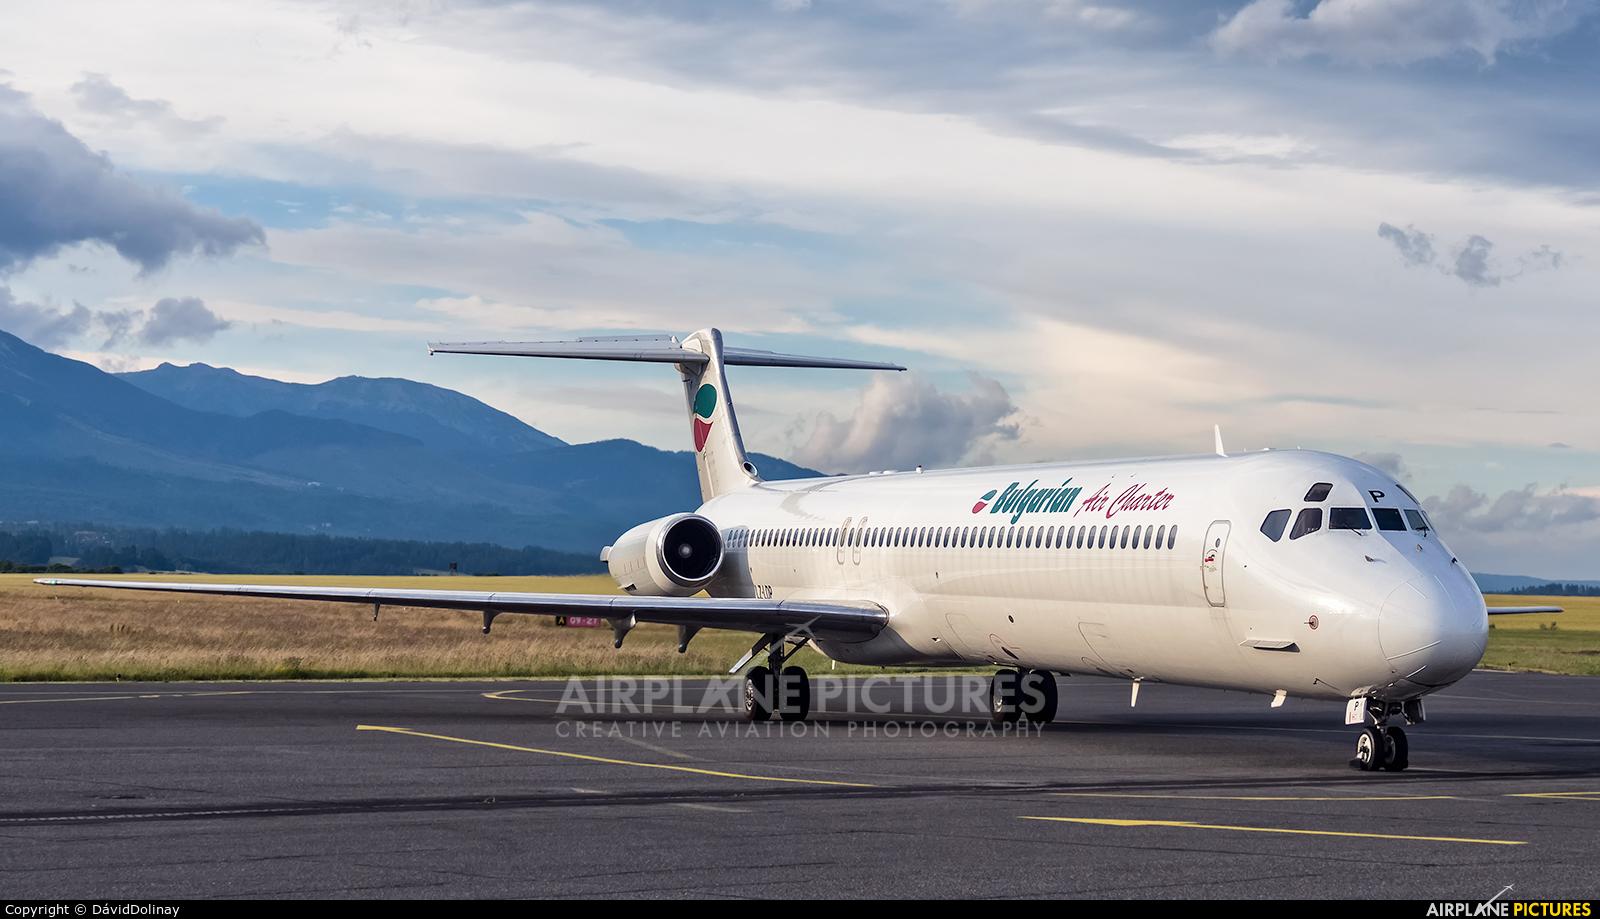 Bulgarian Air Charter LZ-LDP aircraft at Poprad - Tatry